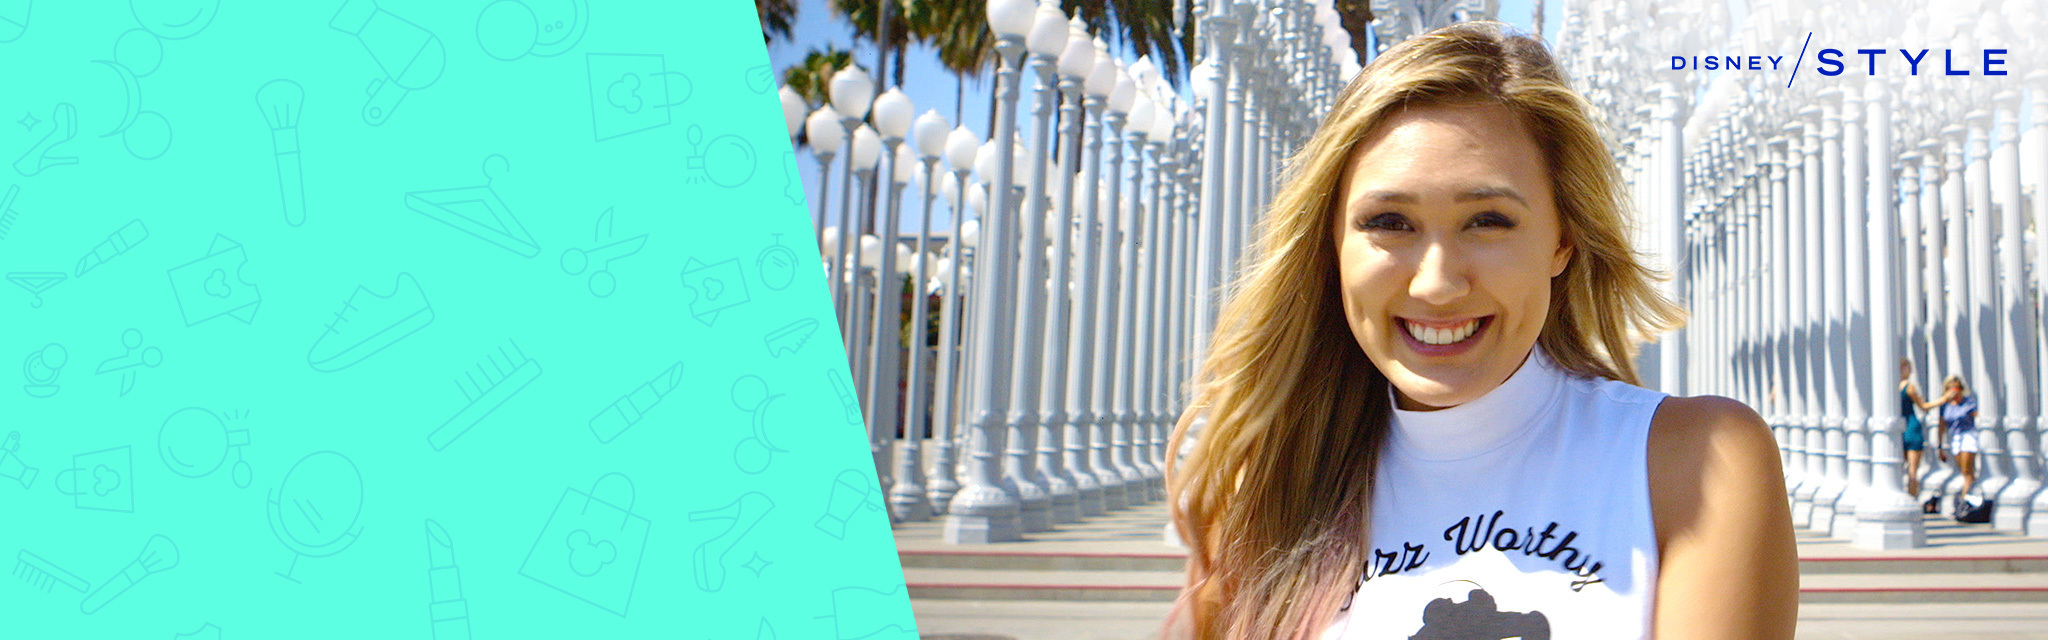 Disney Style - Destination Los Angeles - Hero